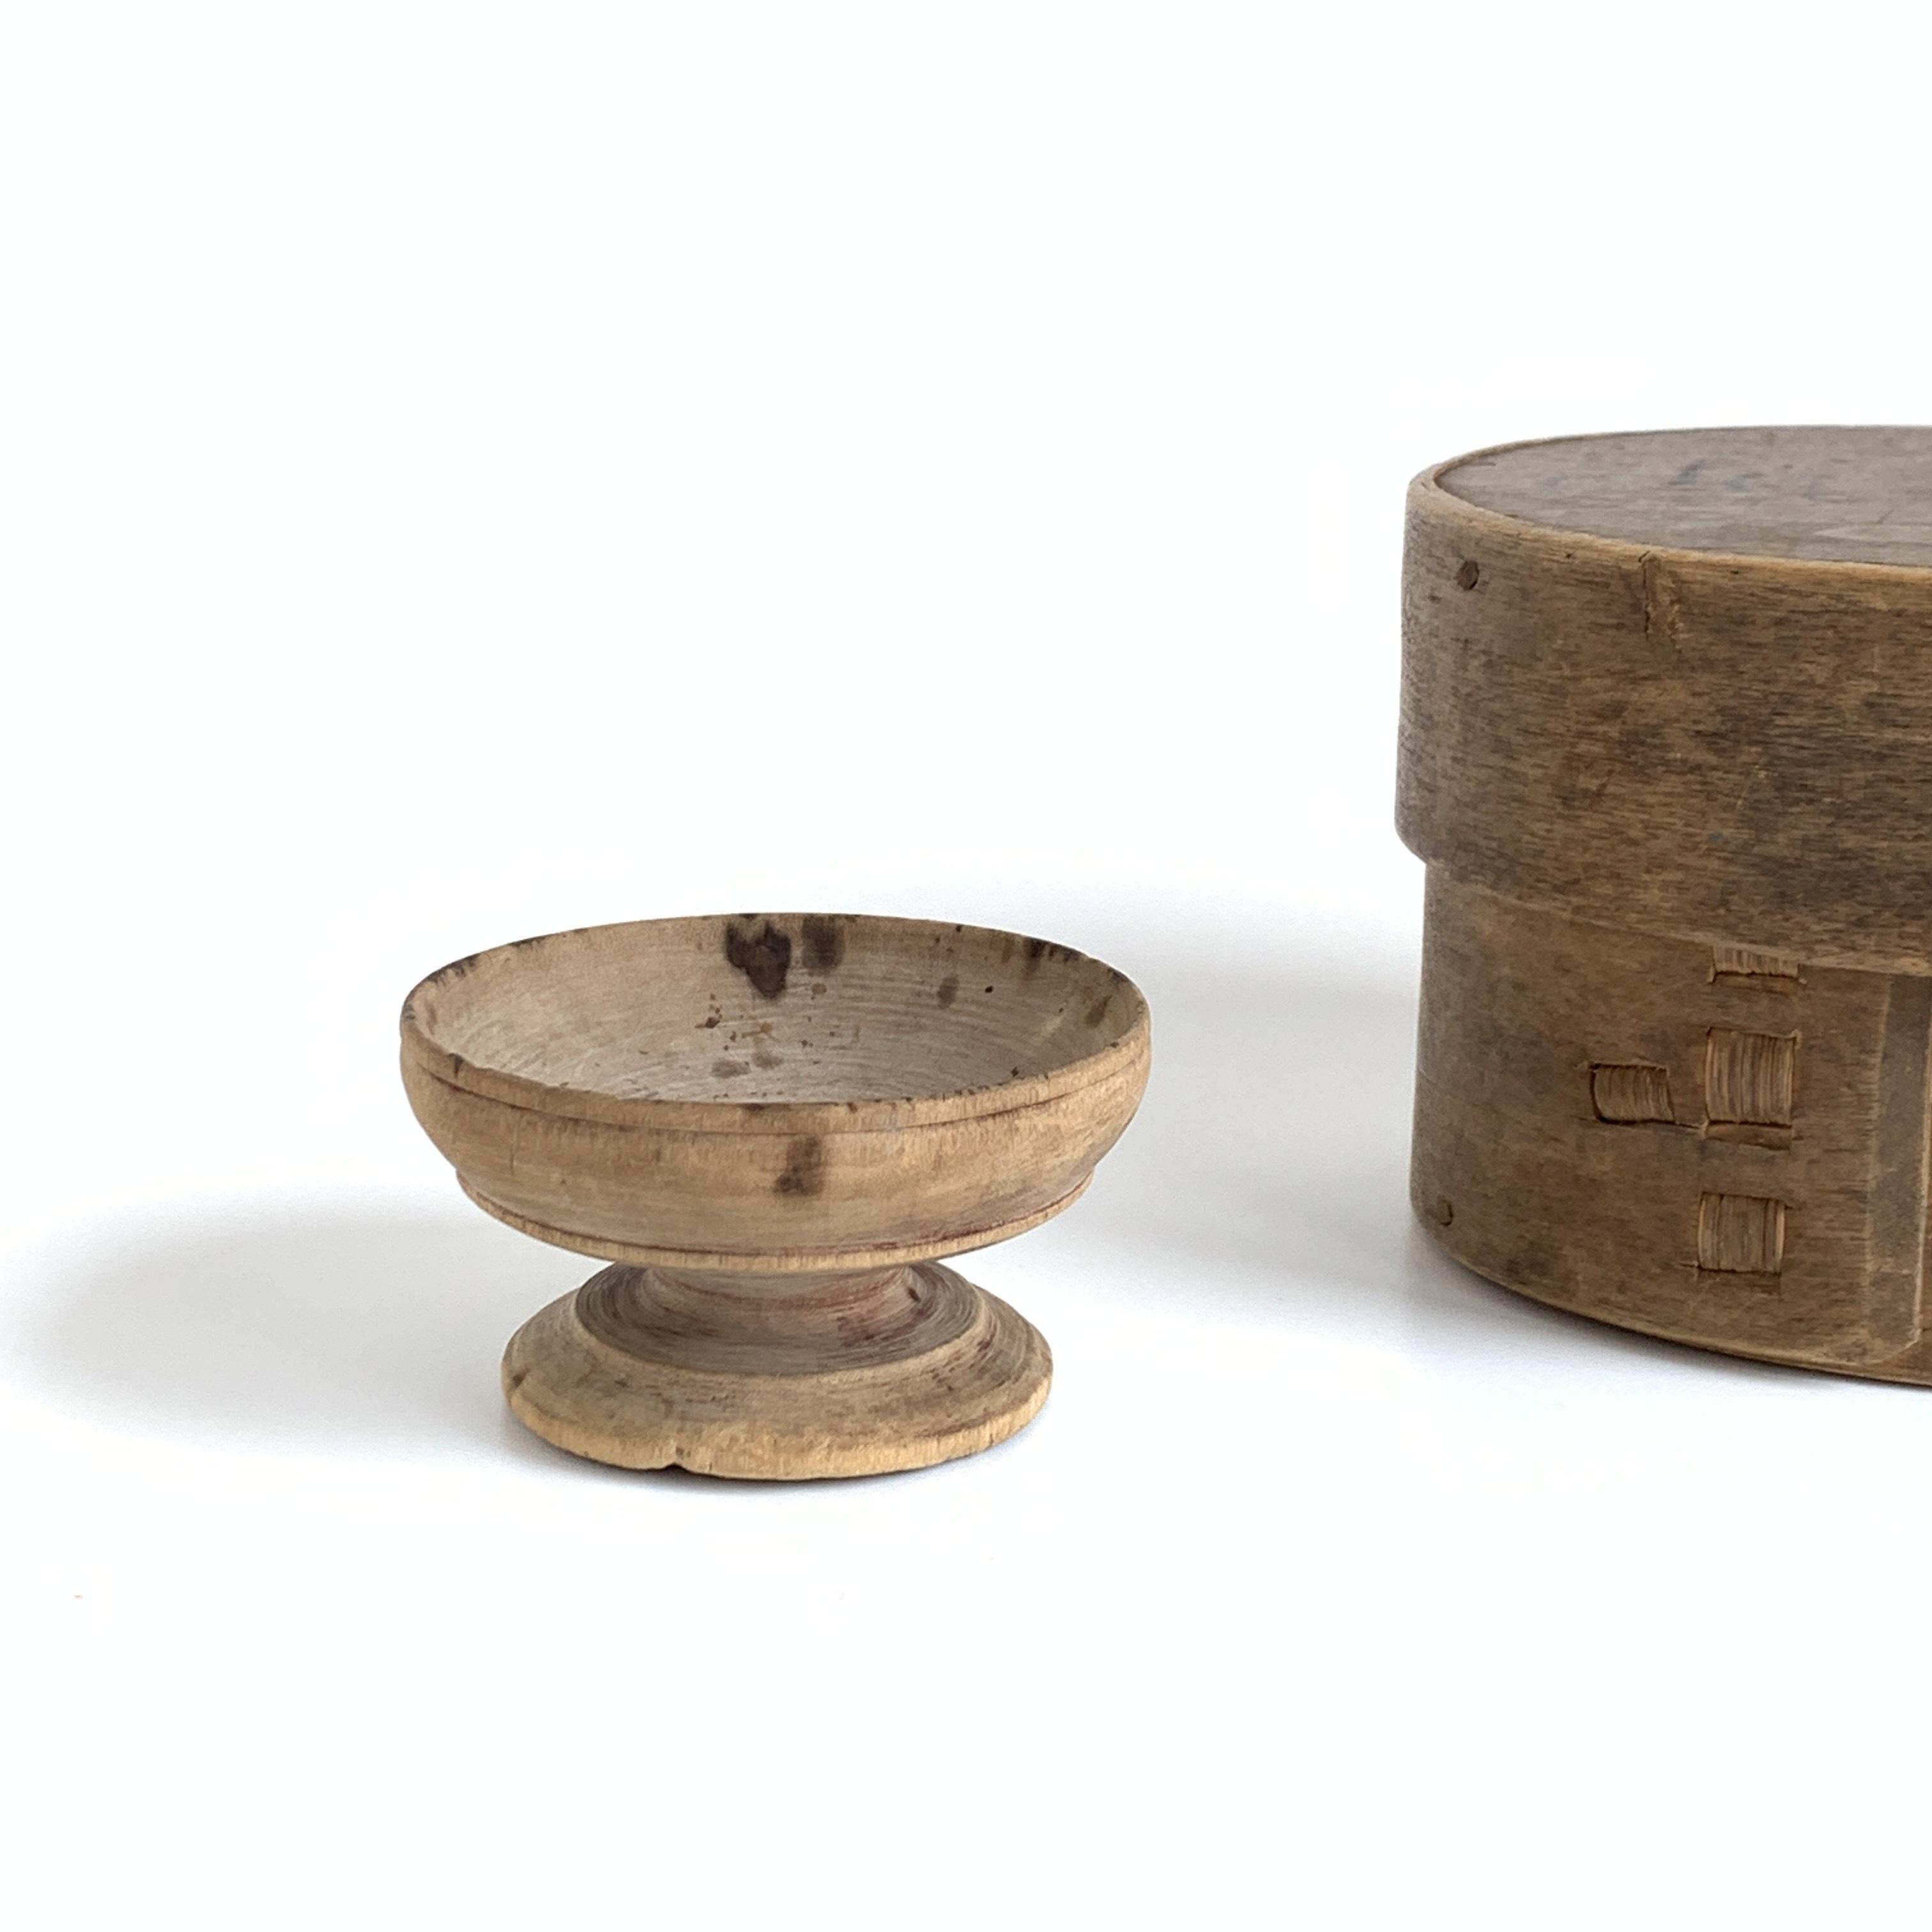 Wooden Salt cup